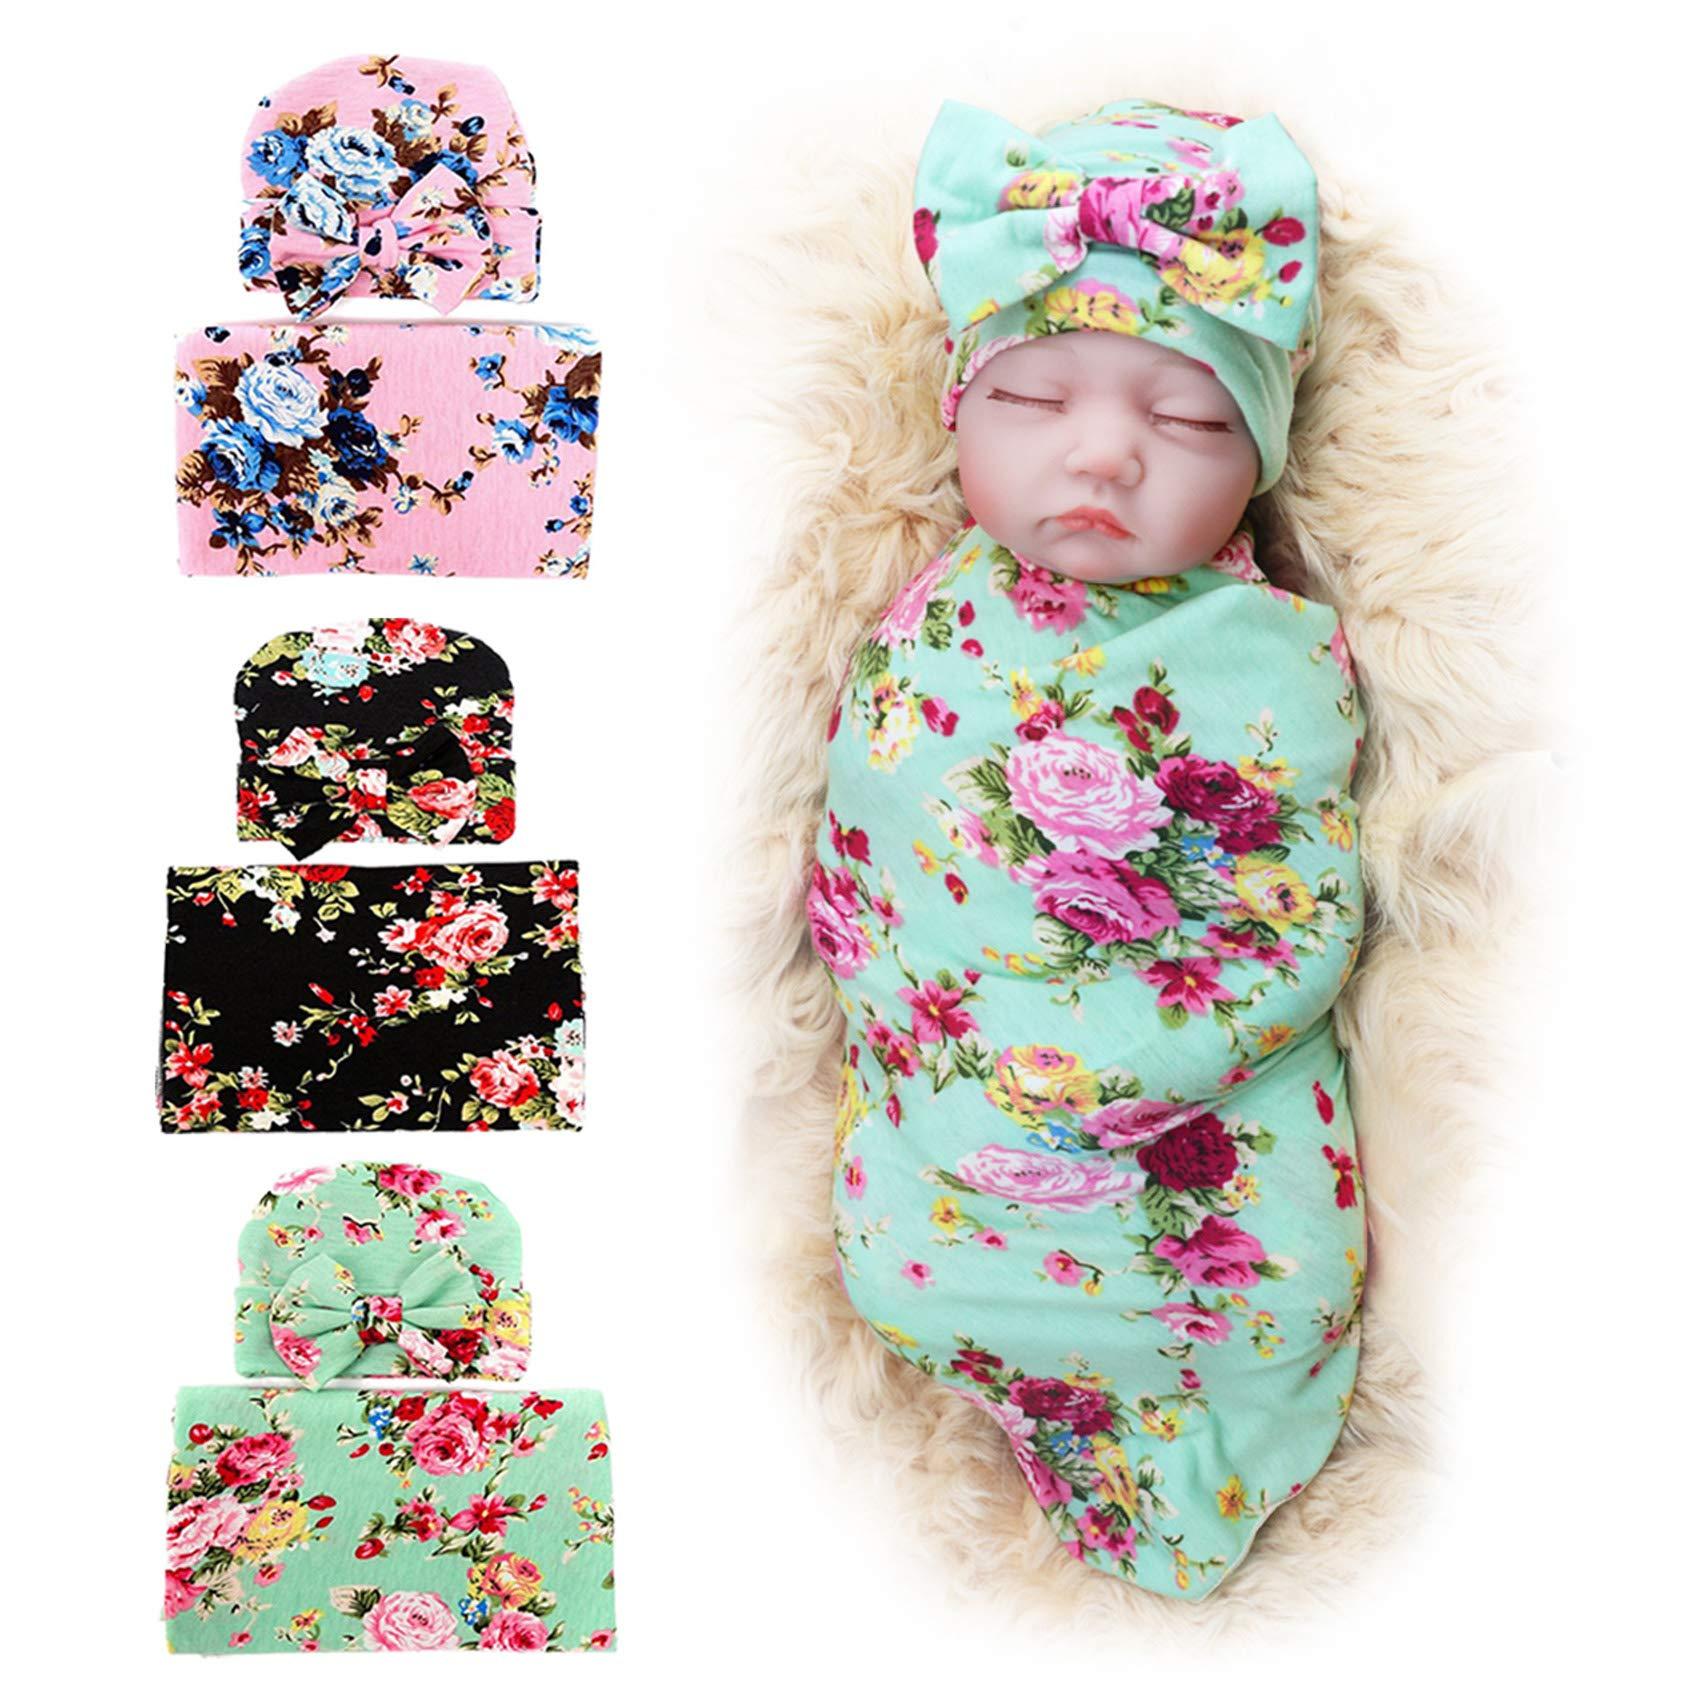 3 Pack BQUBO Newborn Floral Receiving Blankets Newborn Baby Swaddling with Headbands or Hats Sleepsack Toddler Warm